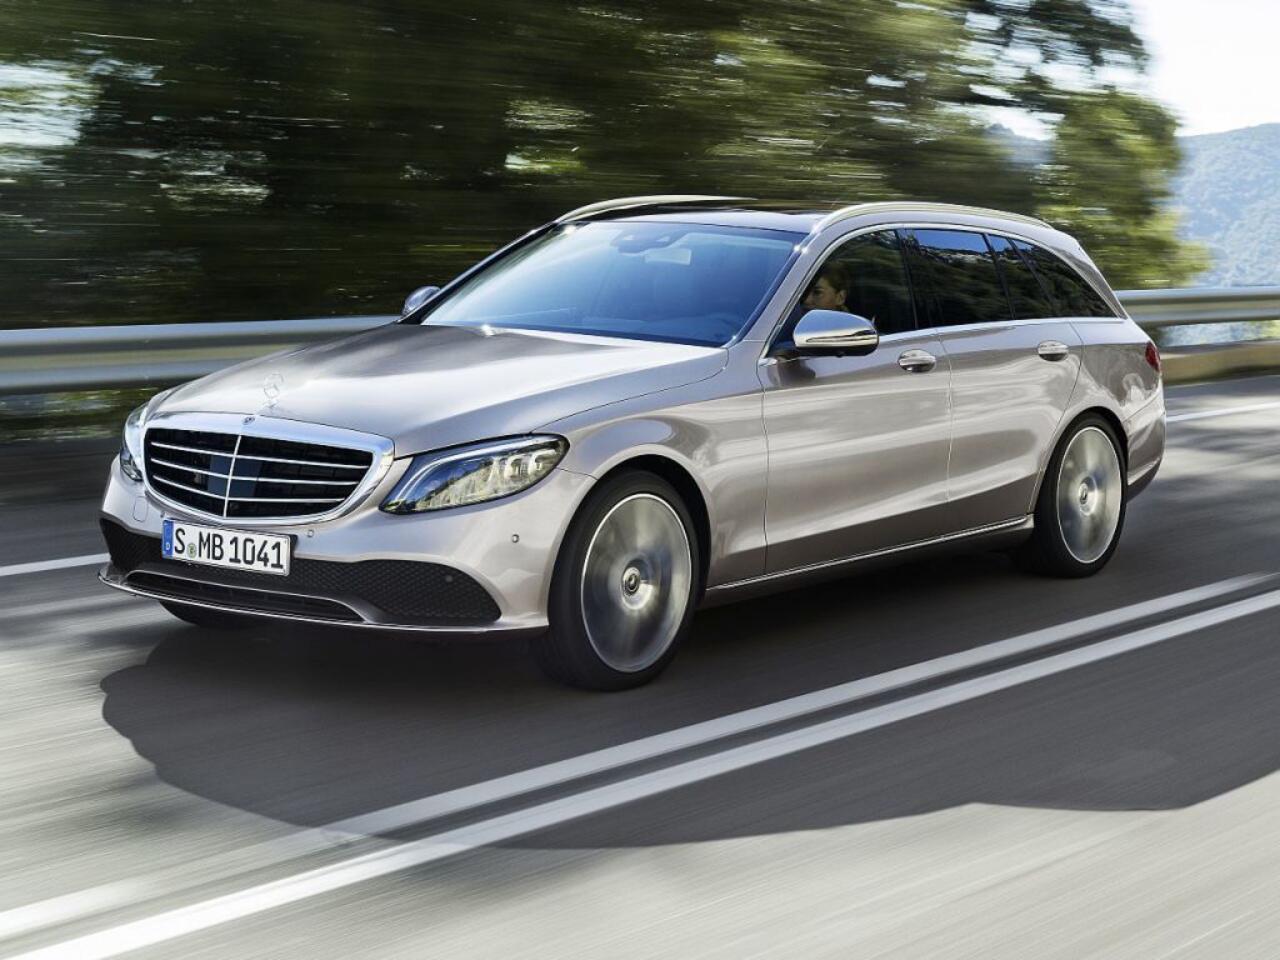 Bild zu Platz 4: Mercedes-Benz C-Klasse